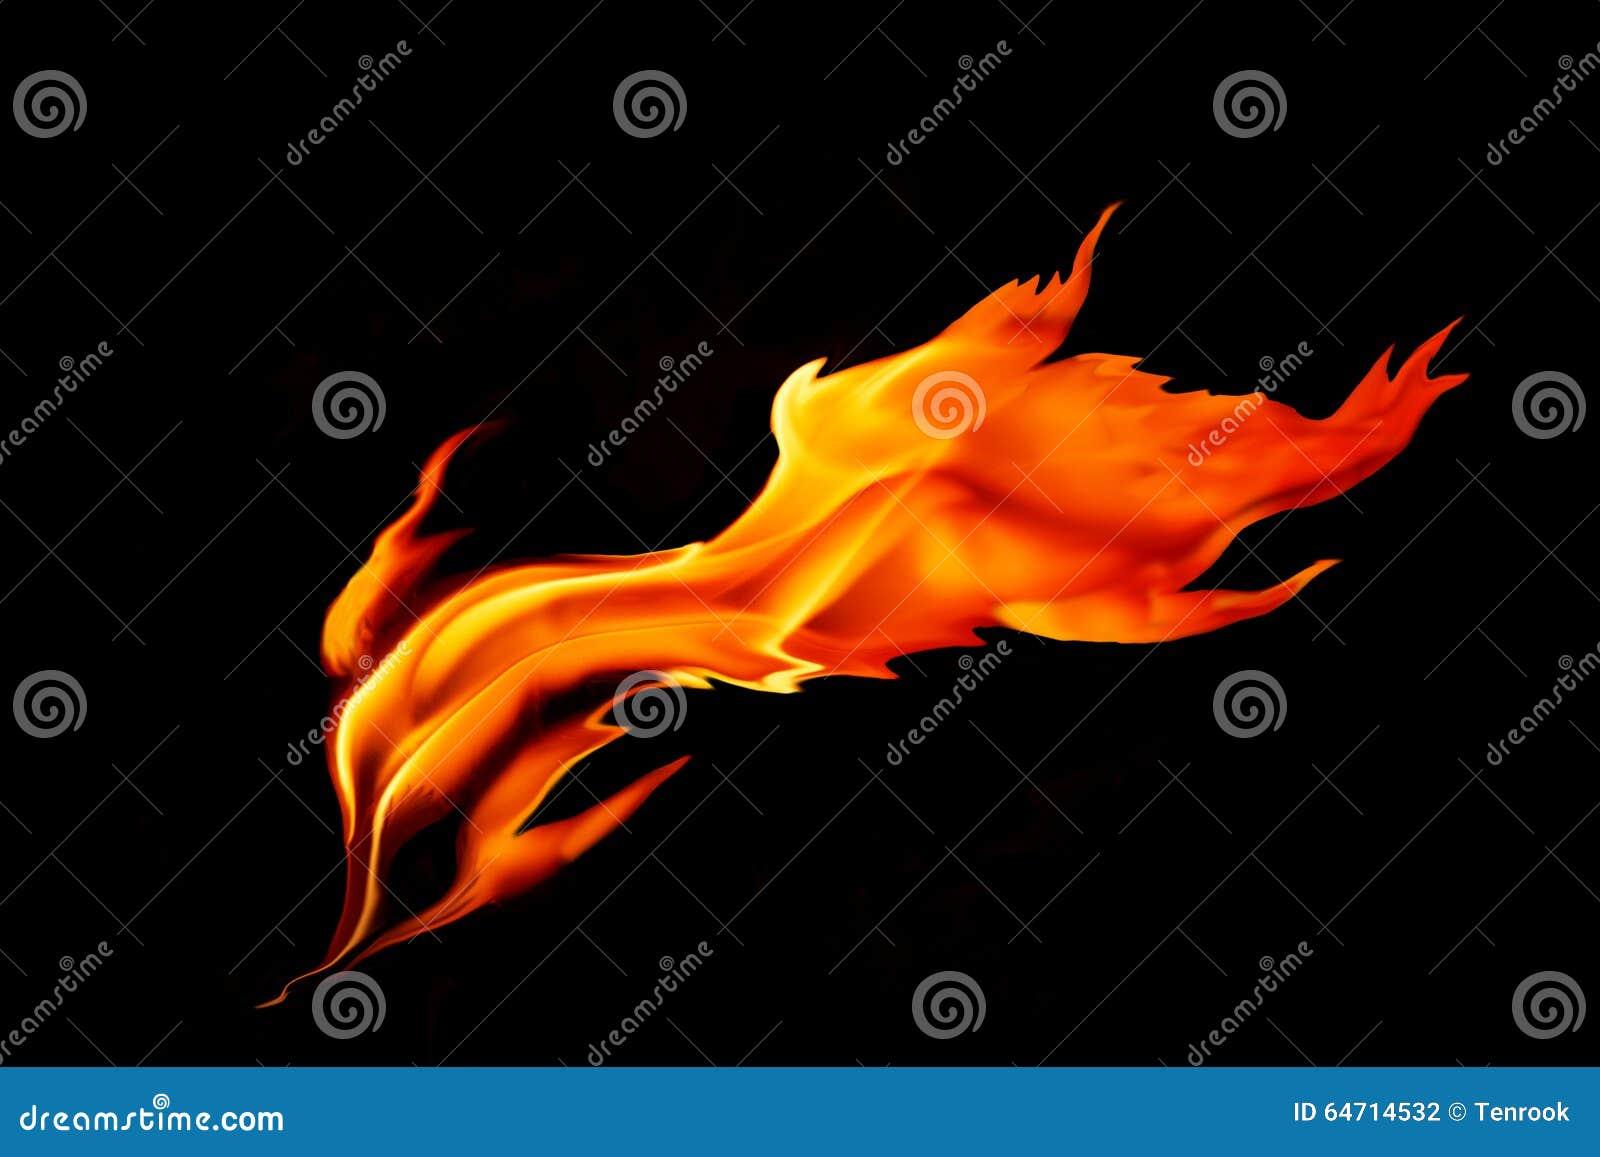 Roodgloeiende die vlam op zwarte achtergrond wordt geïsoleerd